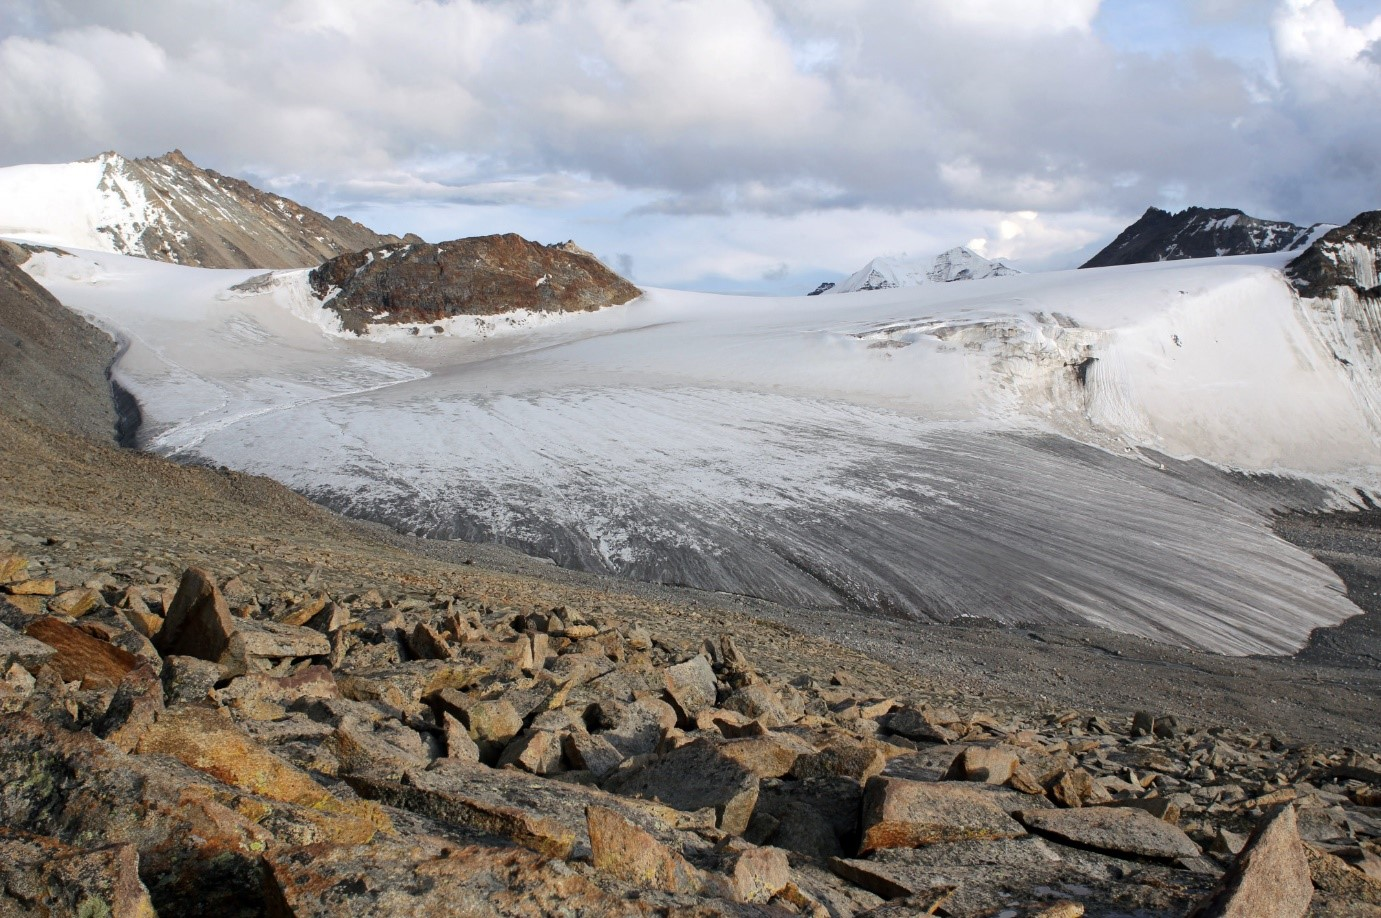 Zhadang glacier - Nature News Scotland